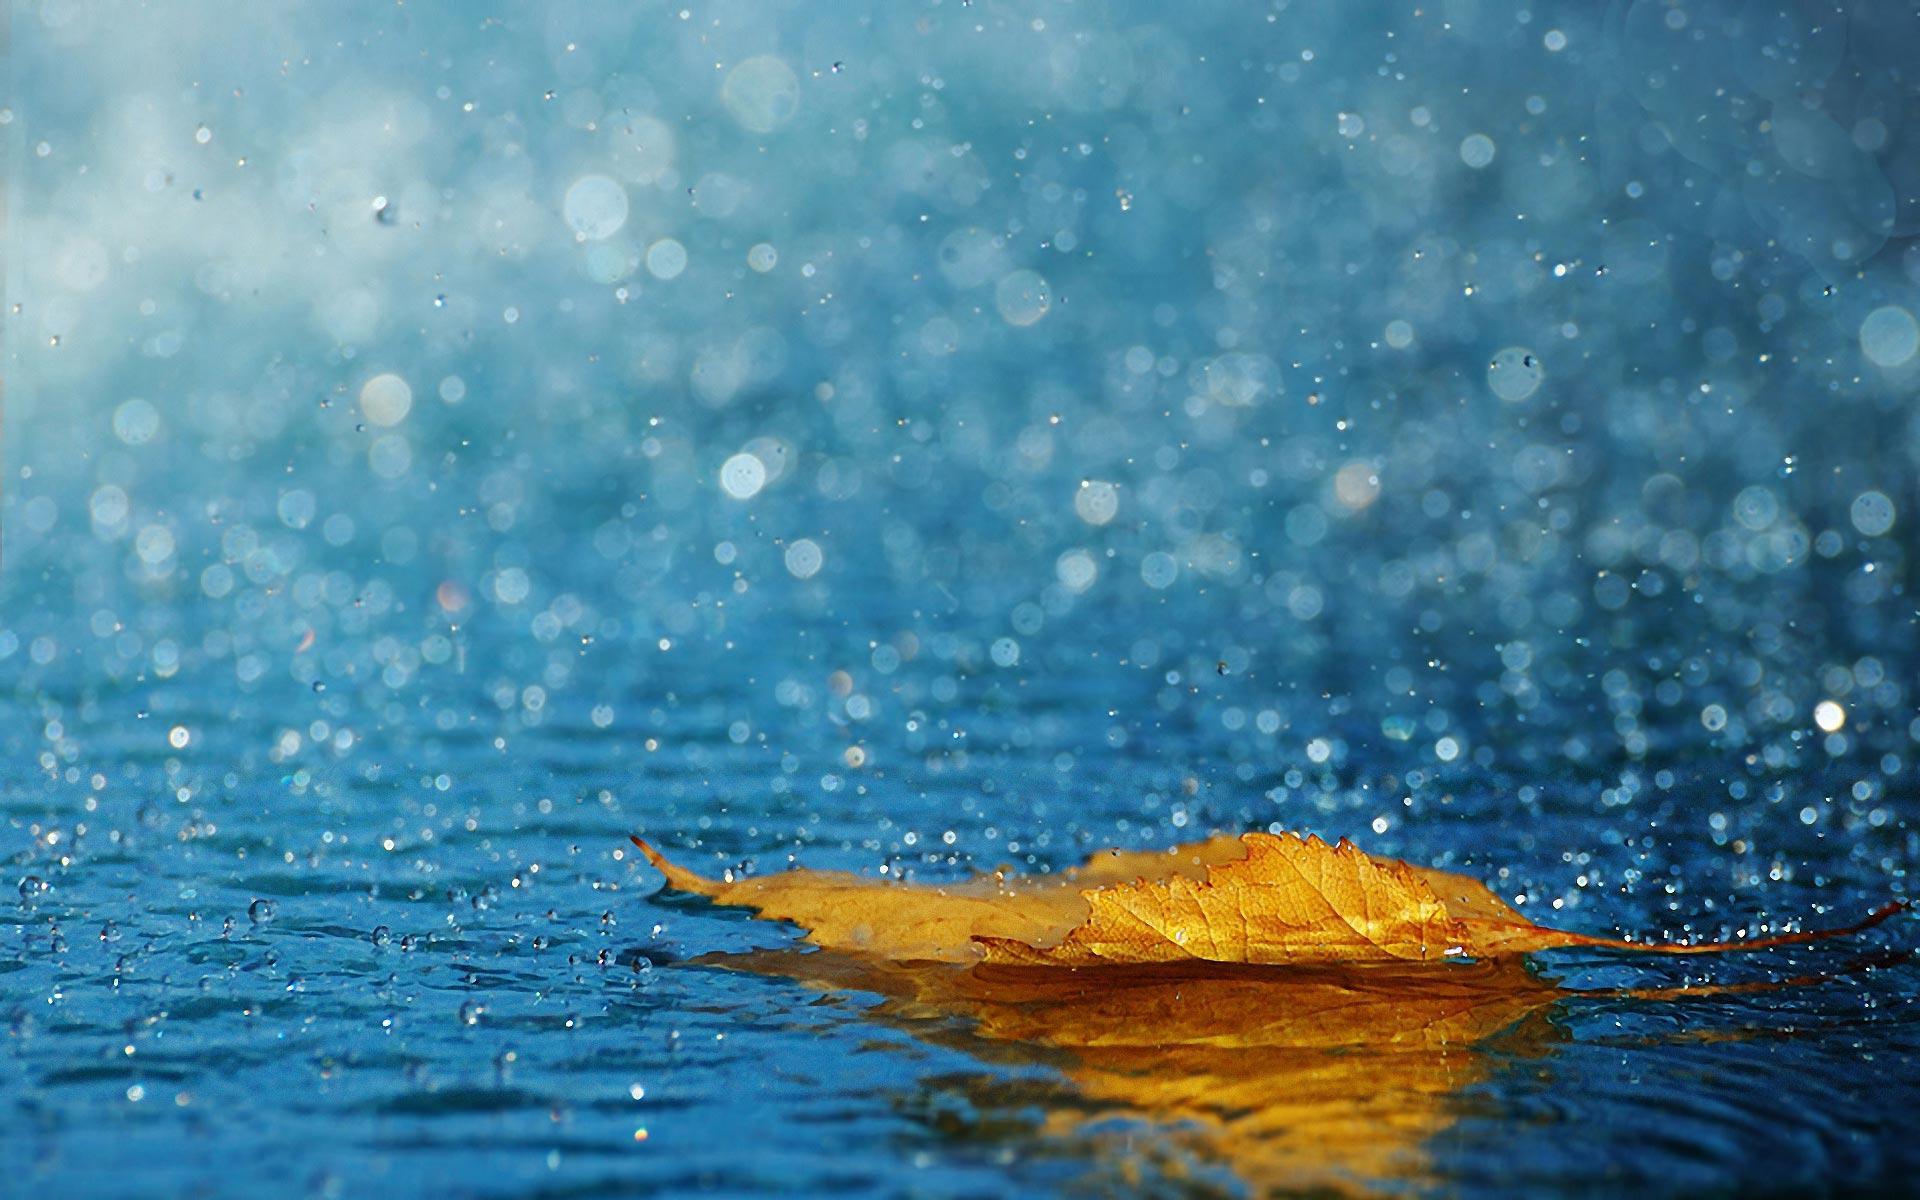 Rainfall Wallpapers Top Free Rainfall Backgrounds Wallpaperaccess